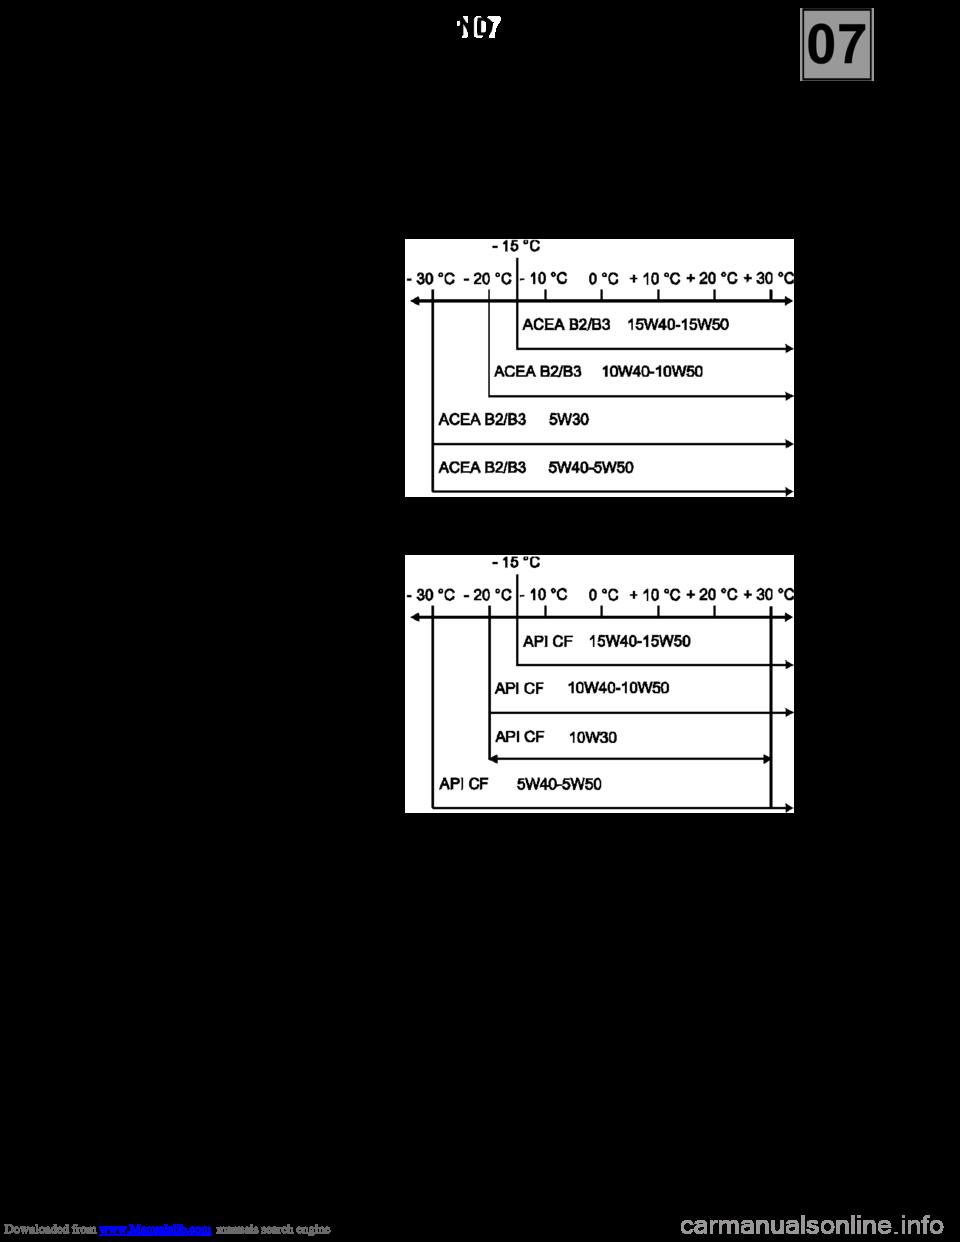 Engine Coolant Renault Espace 2000 J66 3g Technical Note 3426a Fuse Box Workshop Manual Page 3